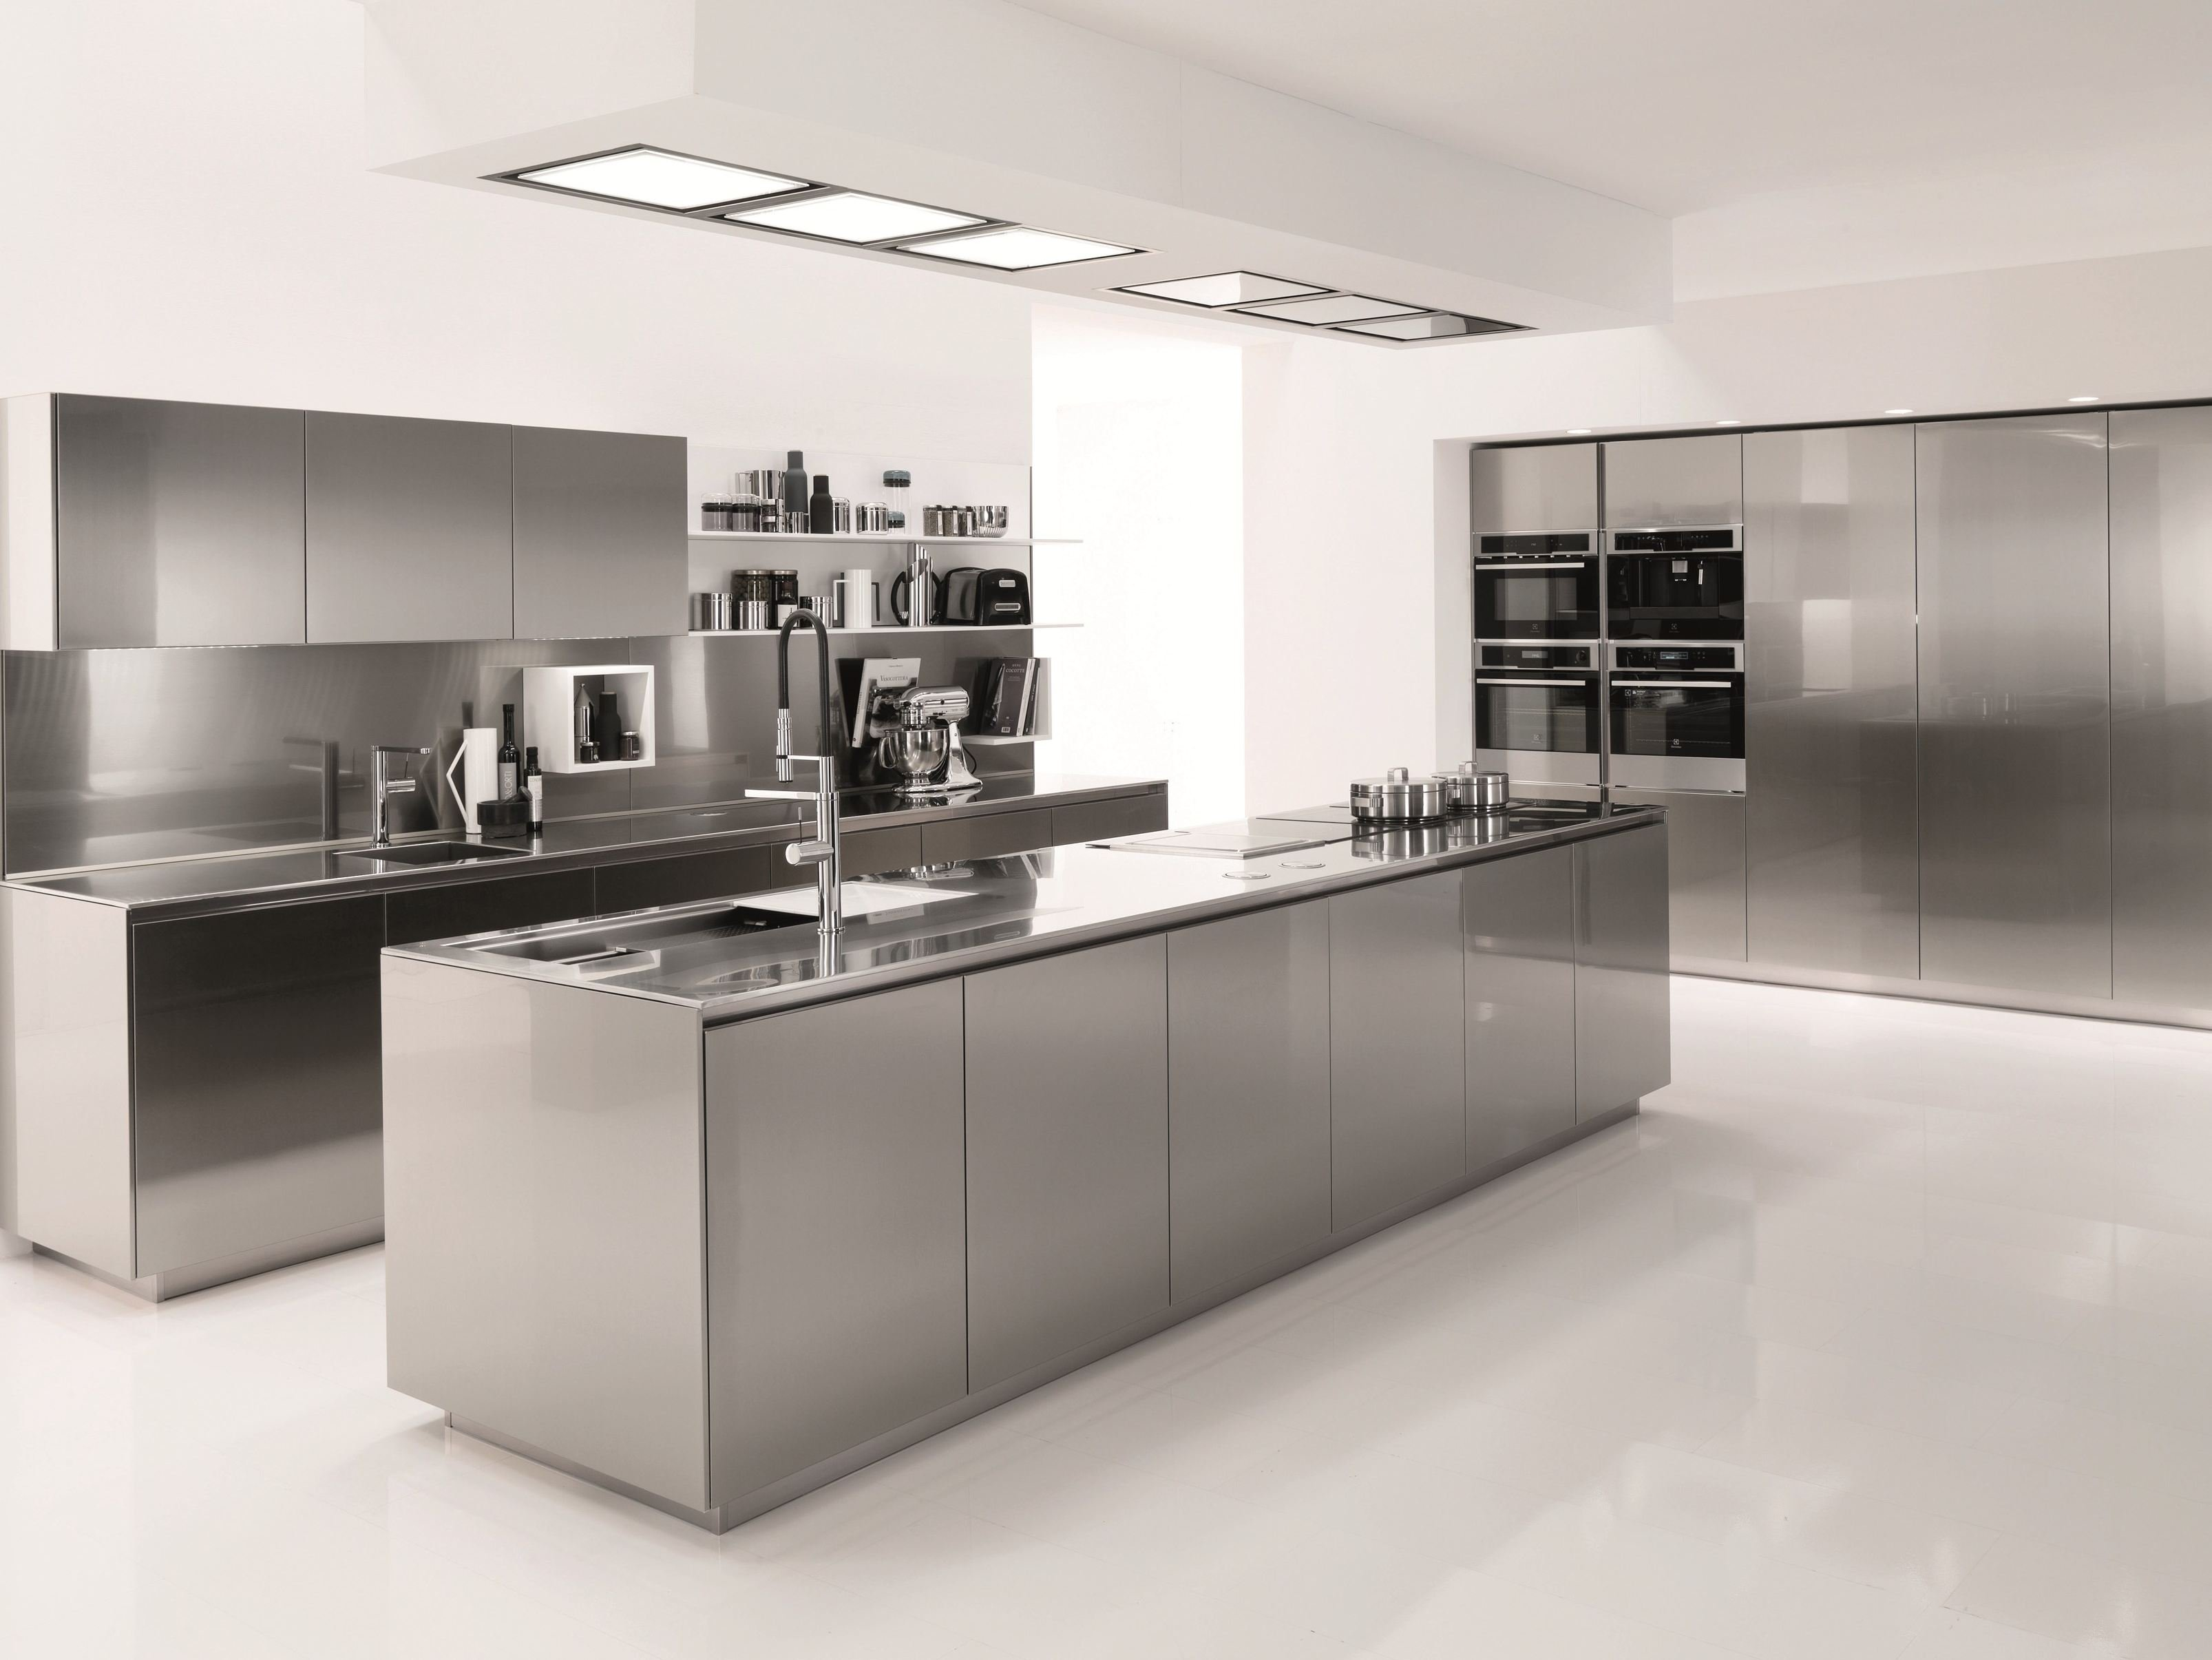 Beautiful Cucine In Acciaio Professionali Ideas - harrop.us - harrop.us